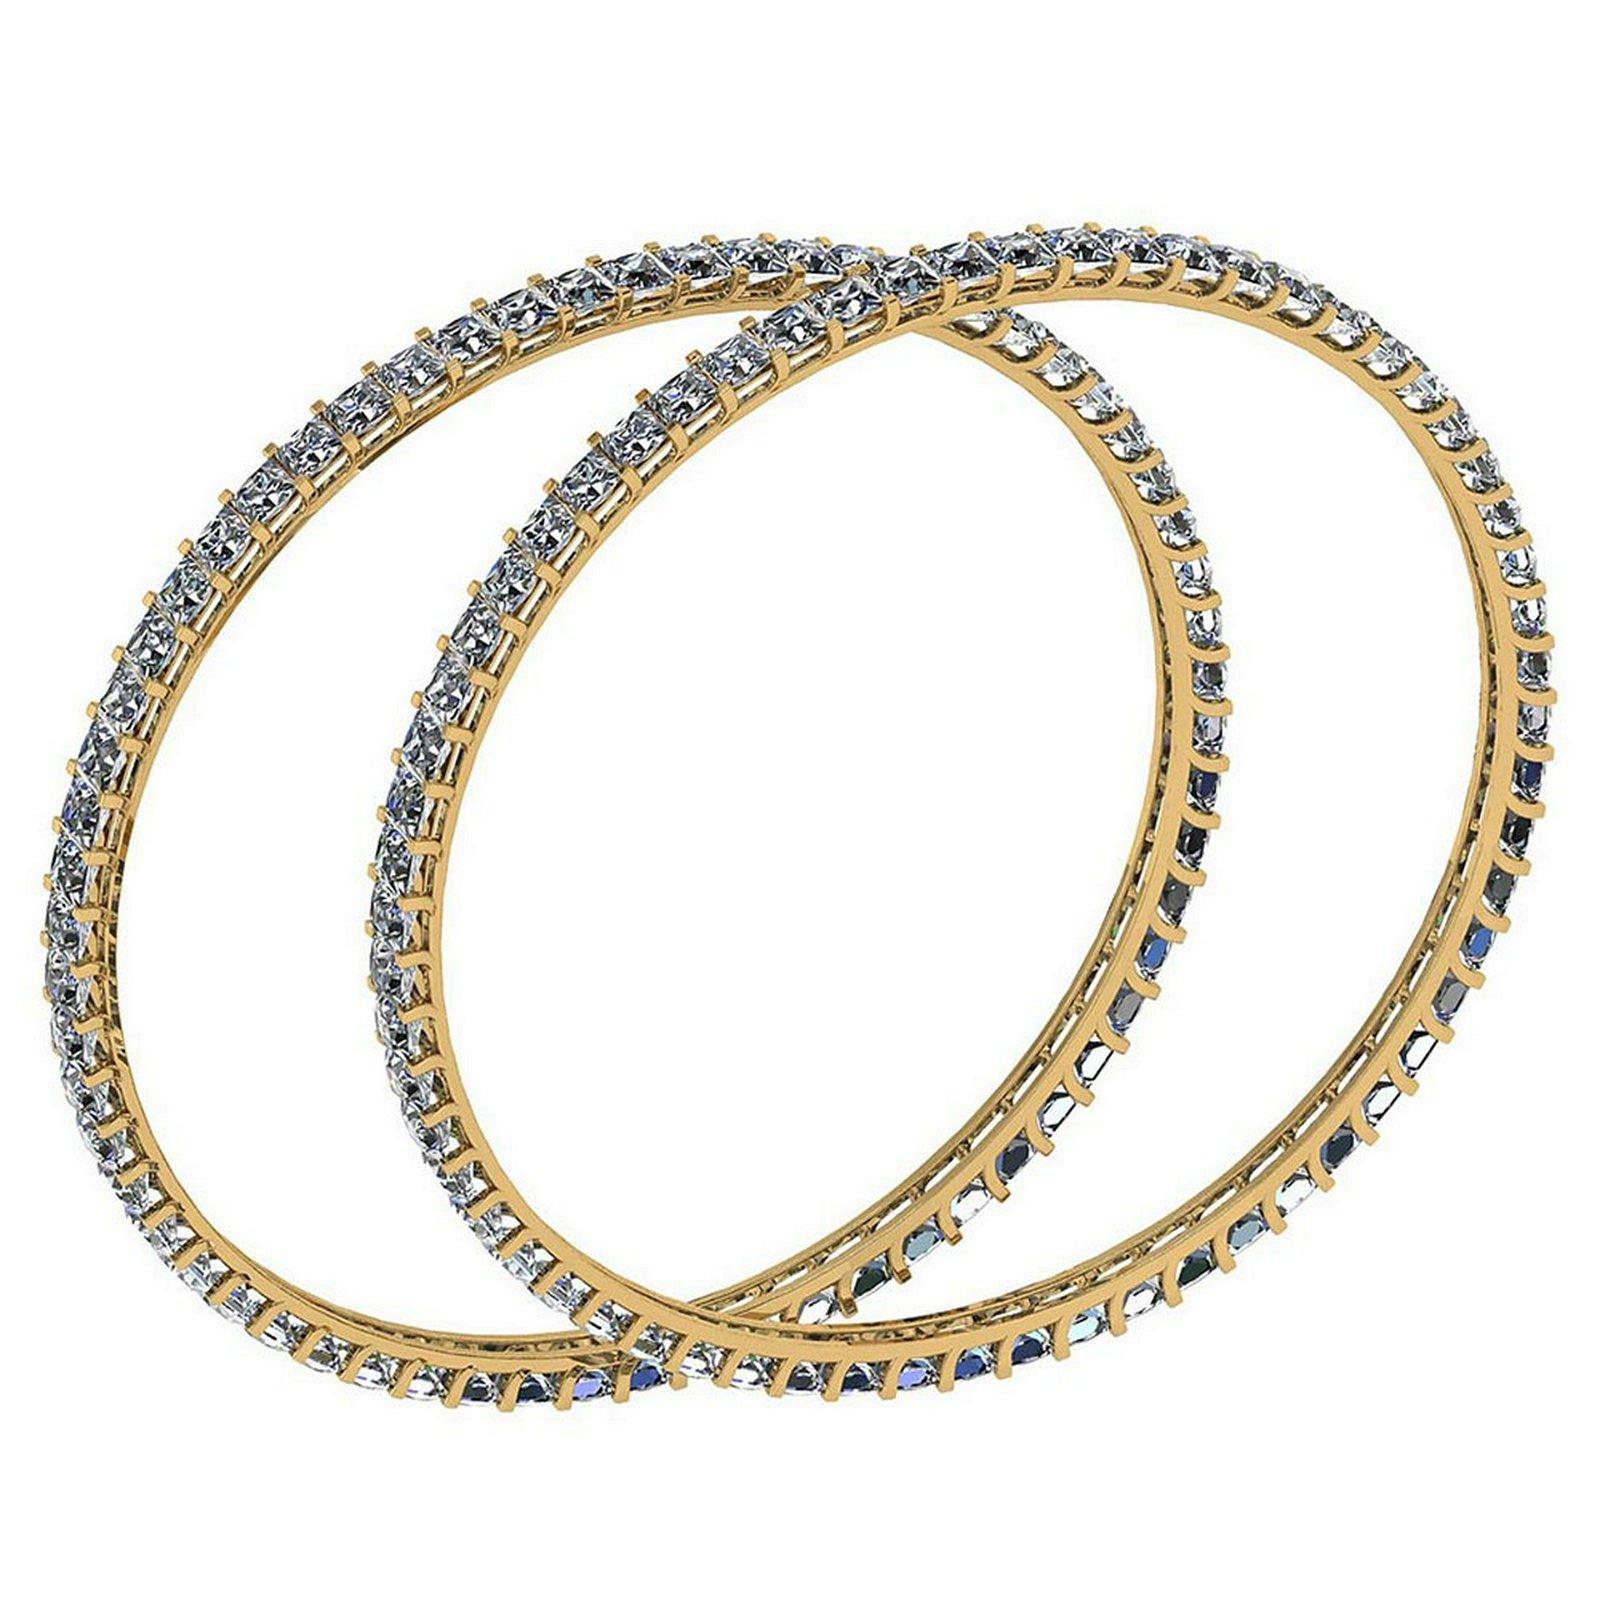 Certified 12.40 Ctw Diamond VS/SI1 Bangles 14K Yellow G